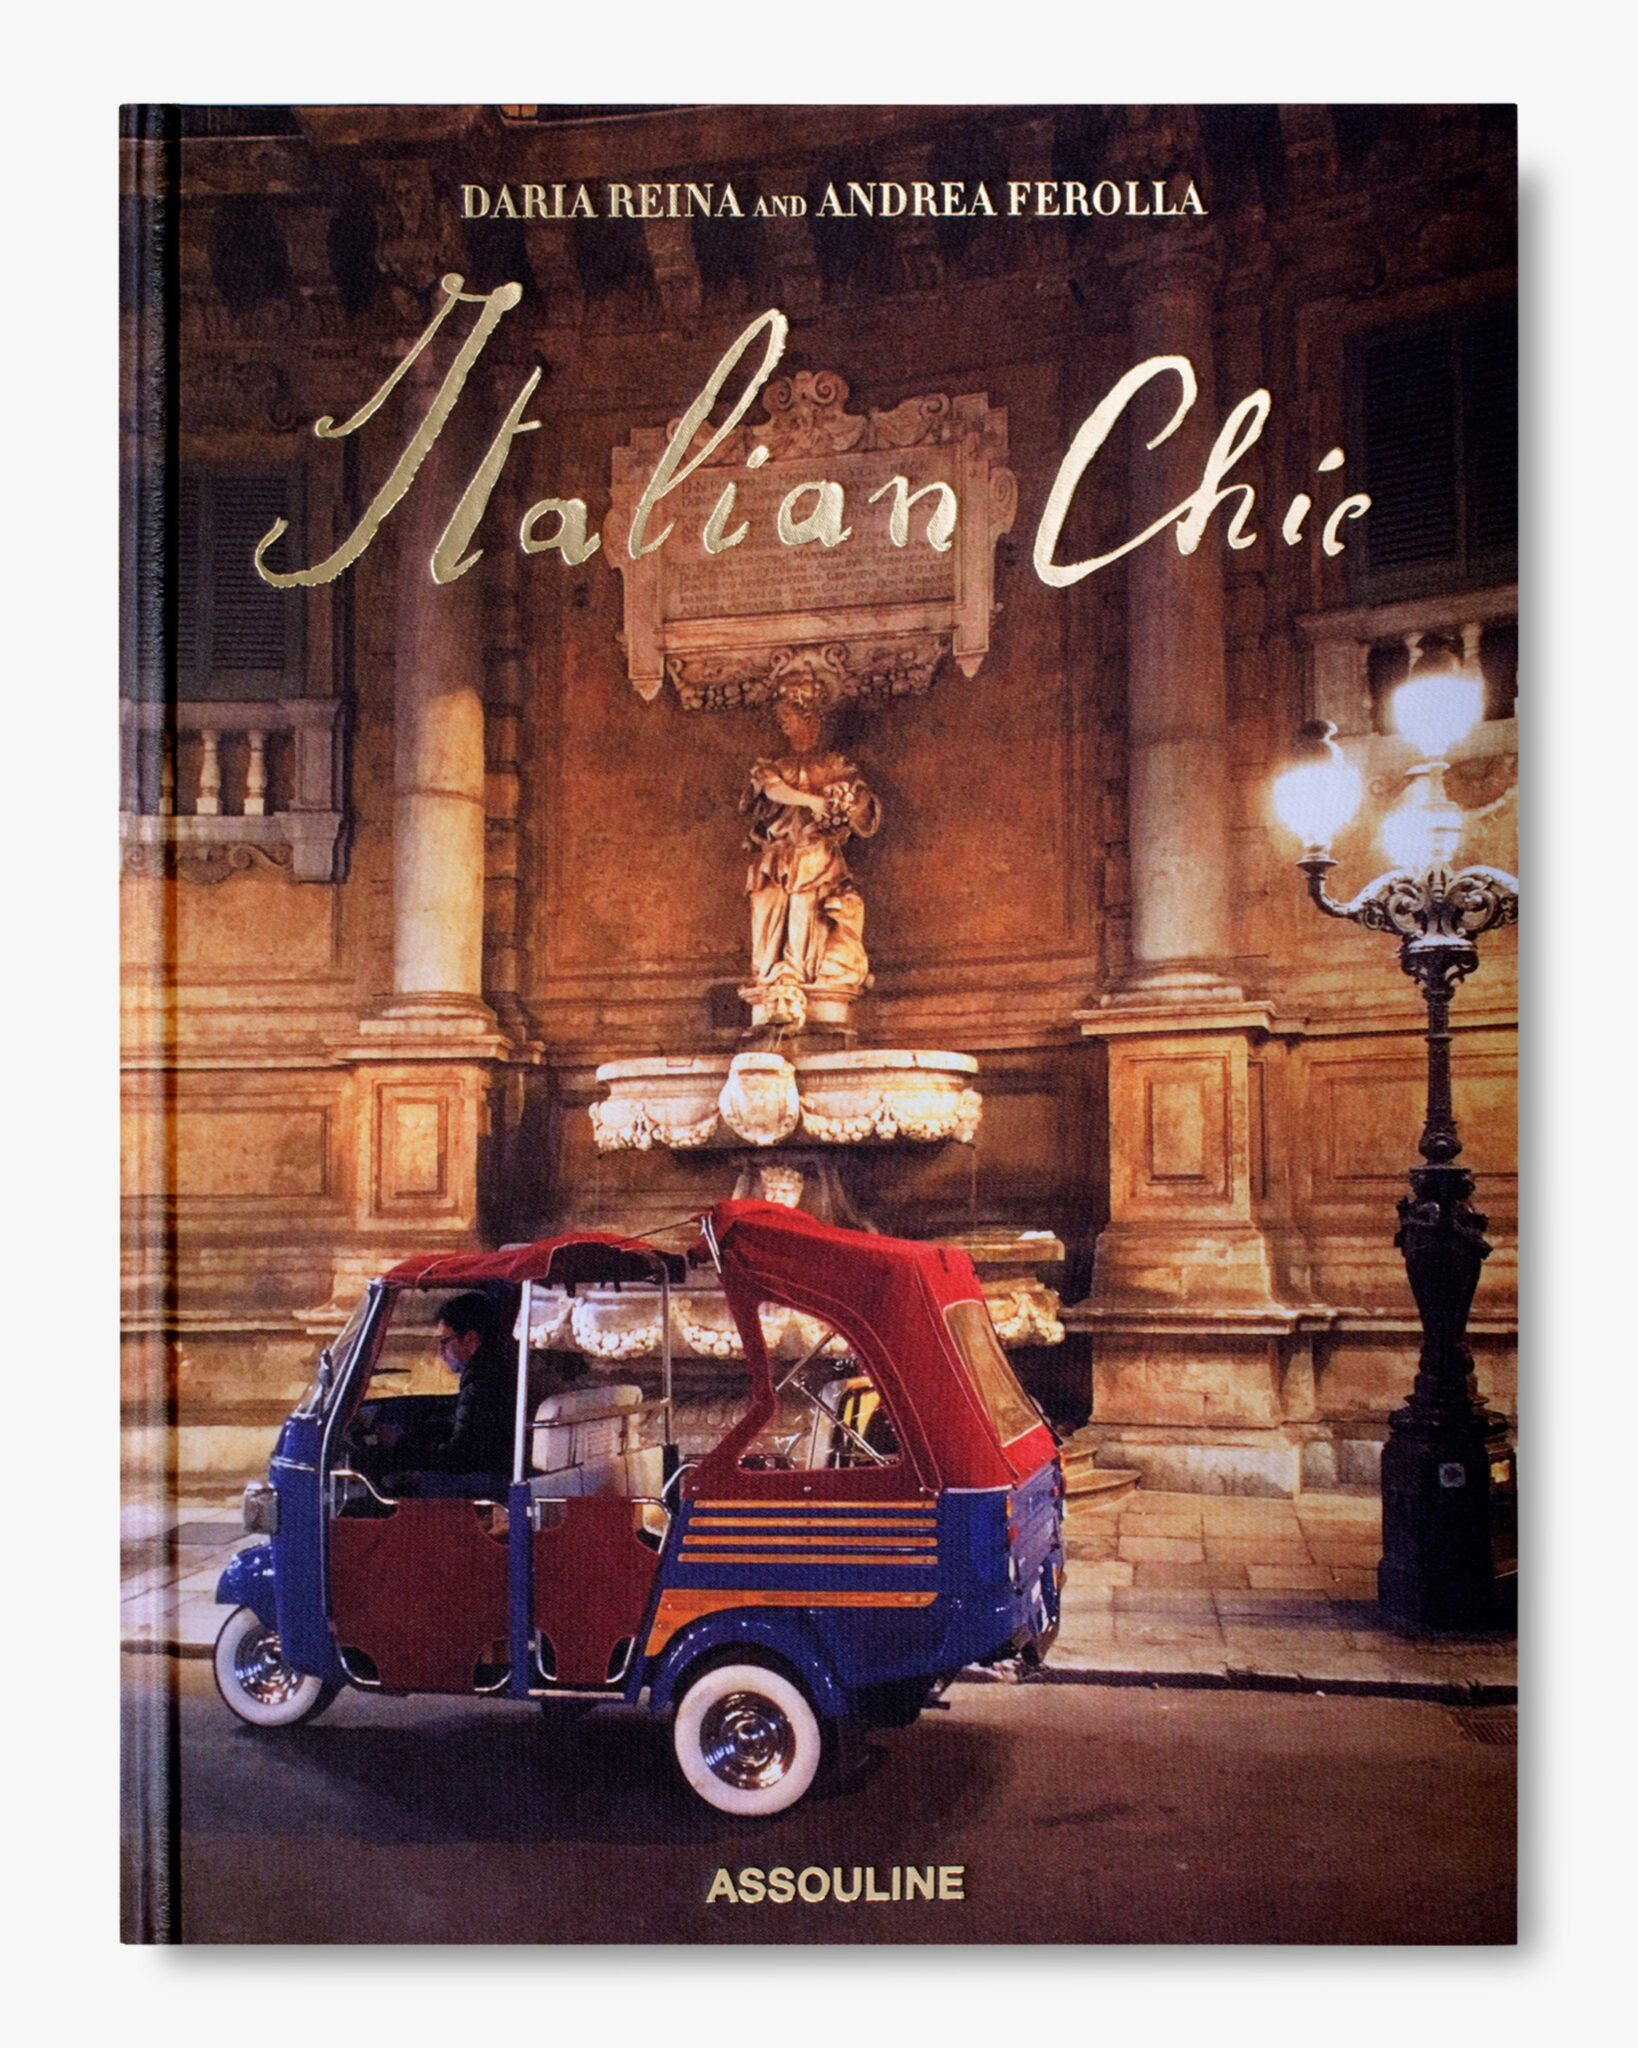 Assouline Italian Chic $95.00